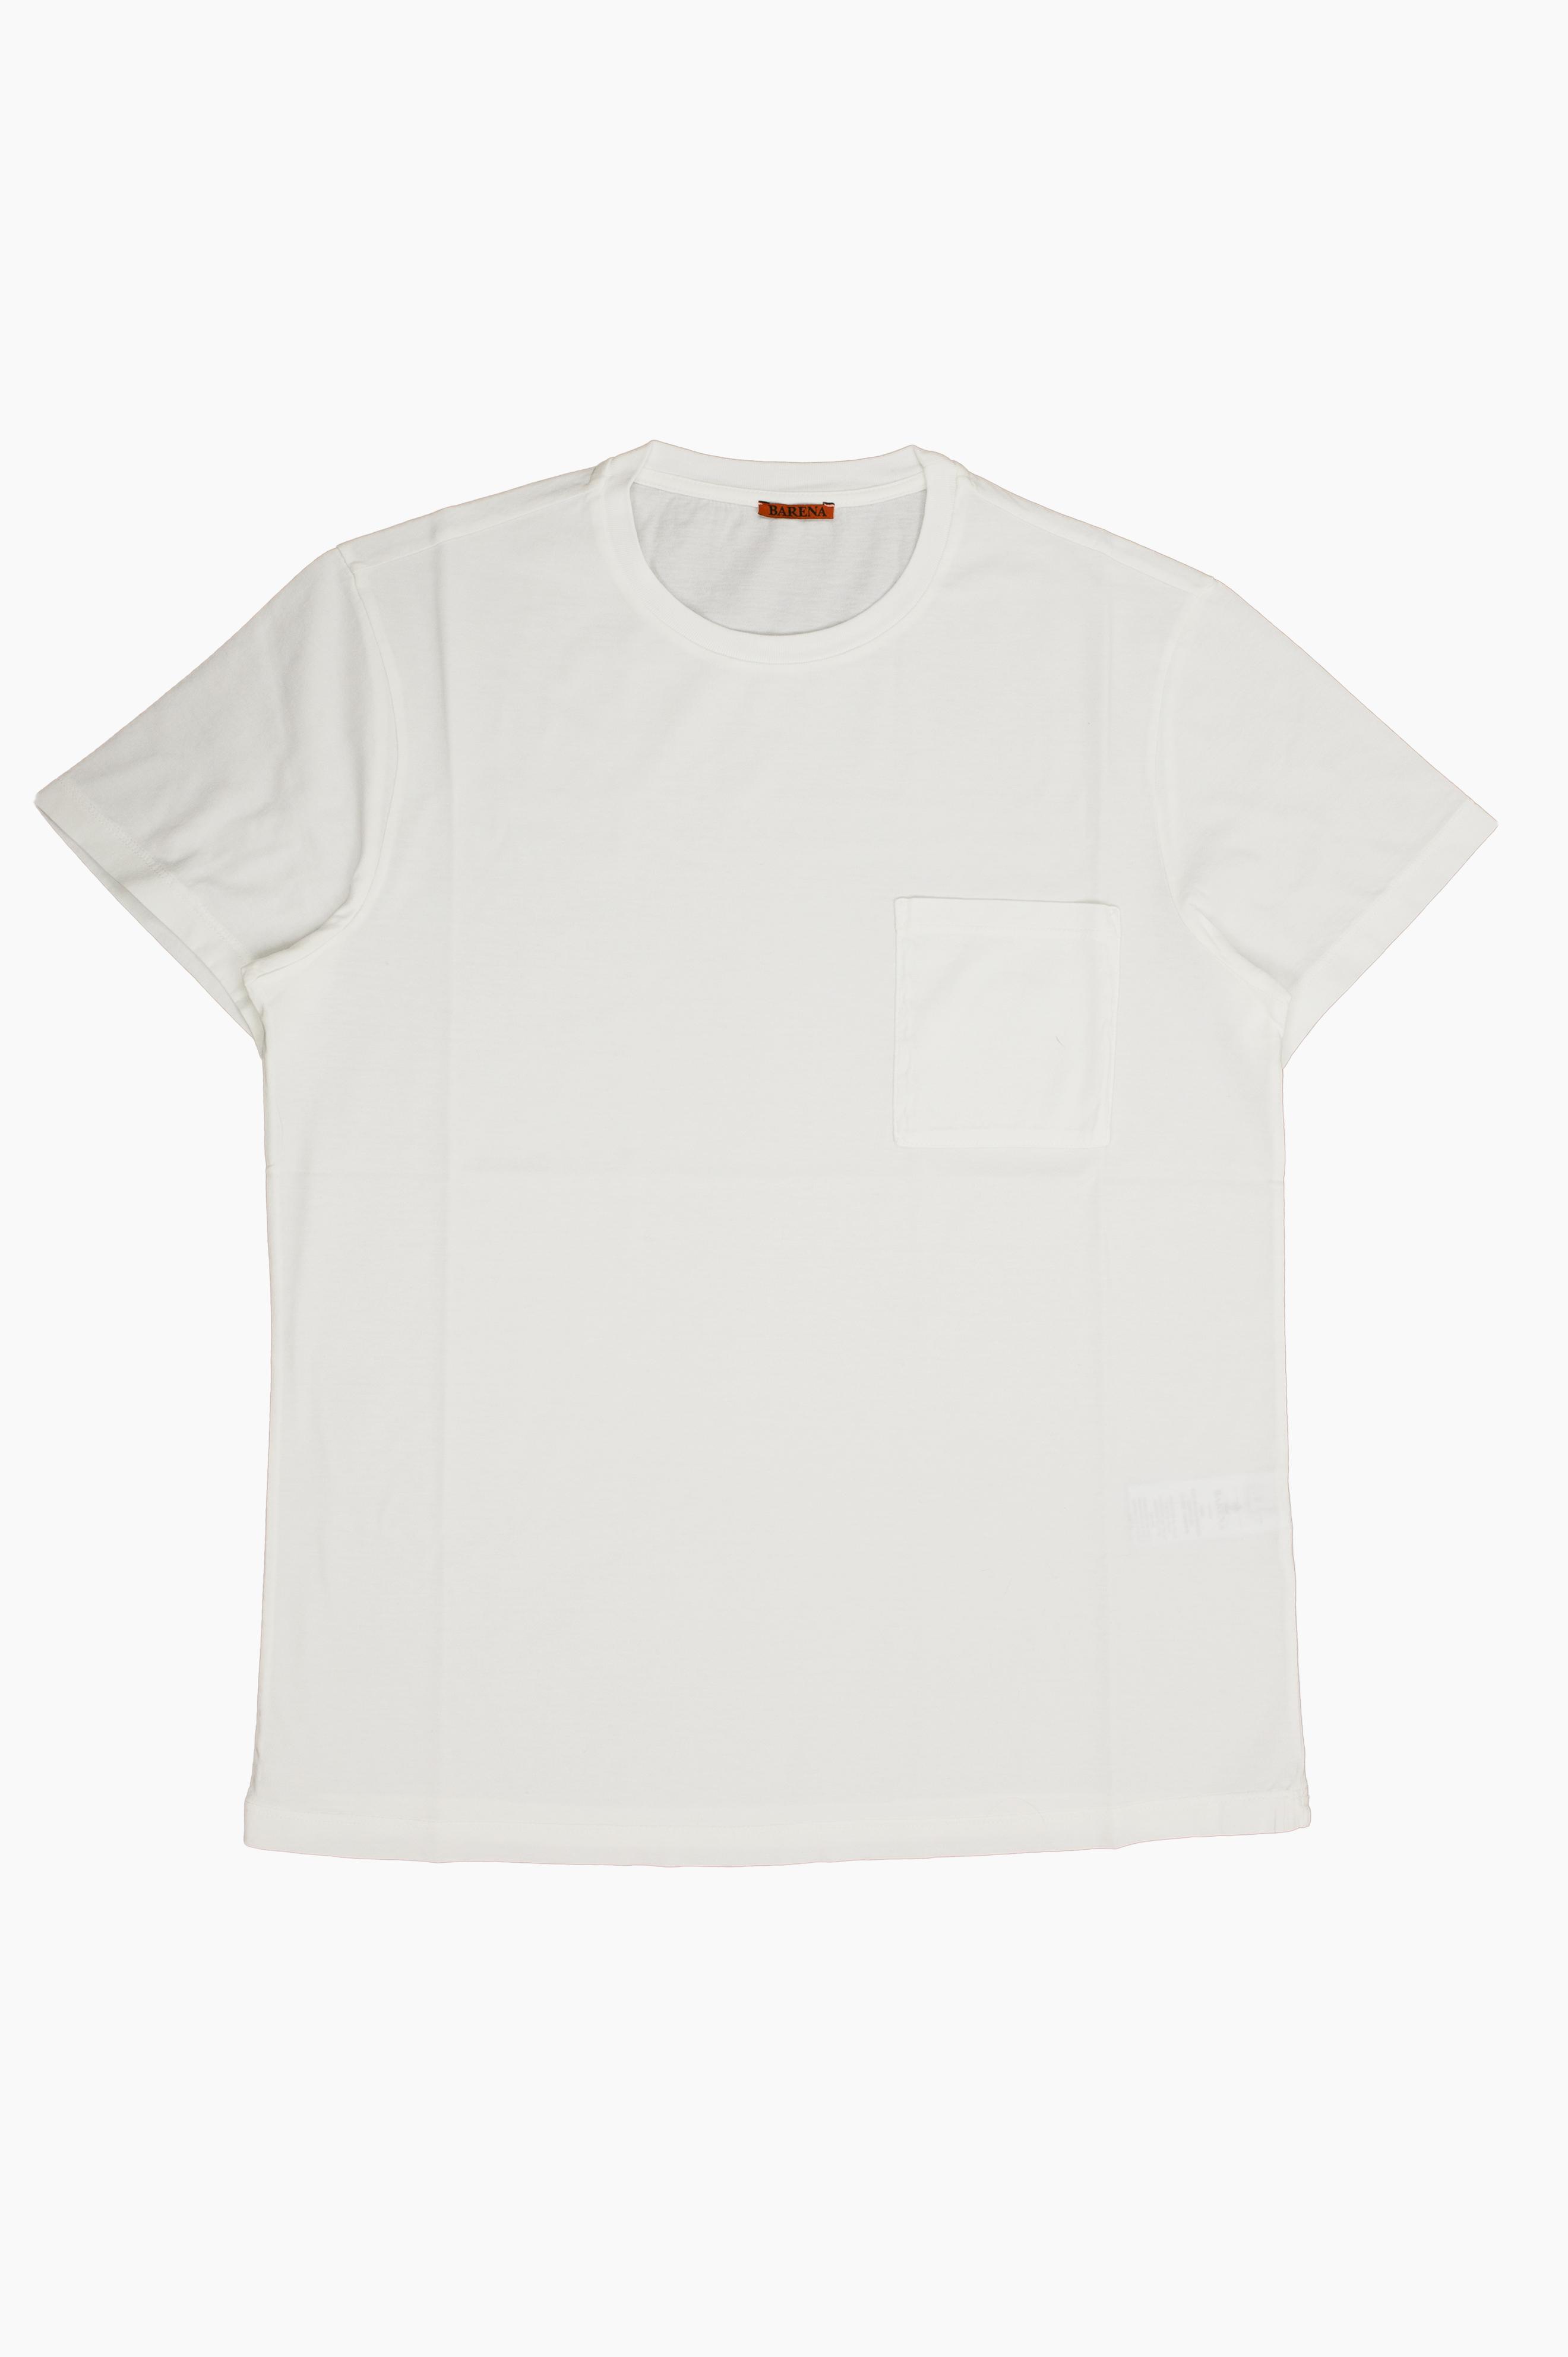 Giro Pocket T-Shirt White